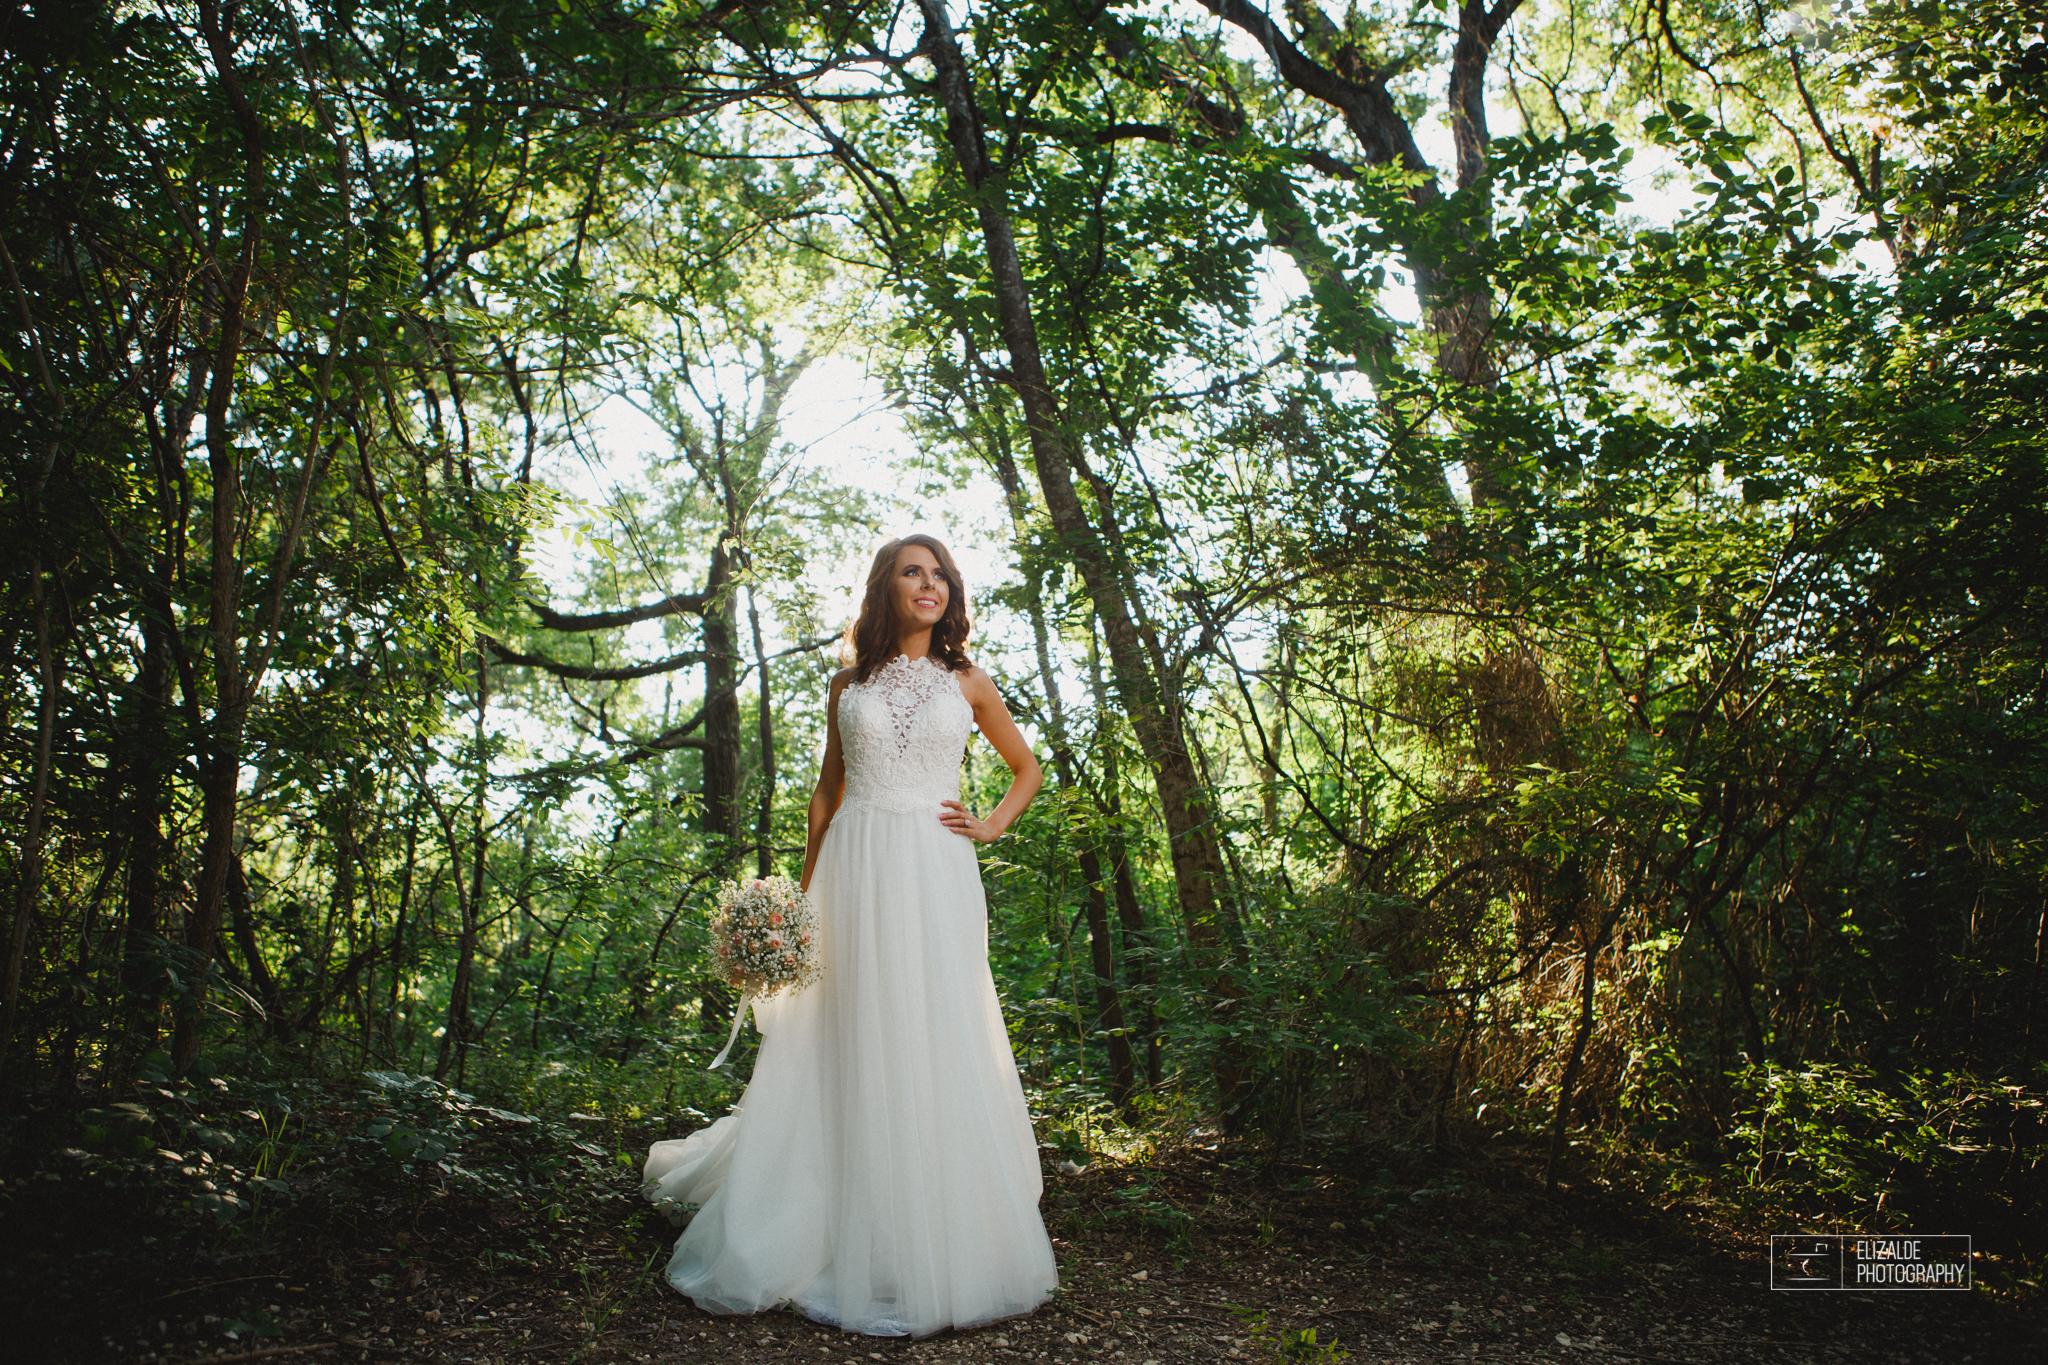 Bridal session_Dallas Photographer_Elizalde Photography_Denton photographer_ DFW Photographer_ Wedding Photographer_Baleigh11.jpg